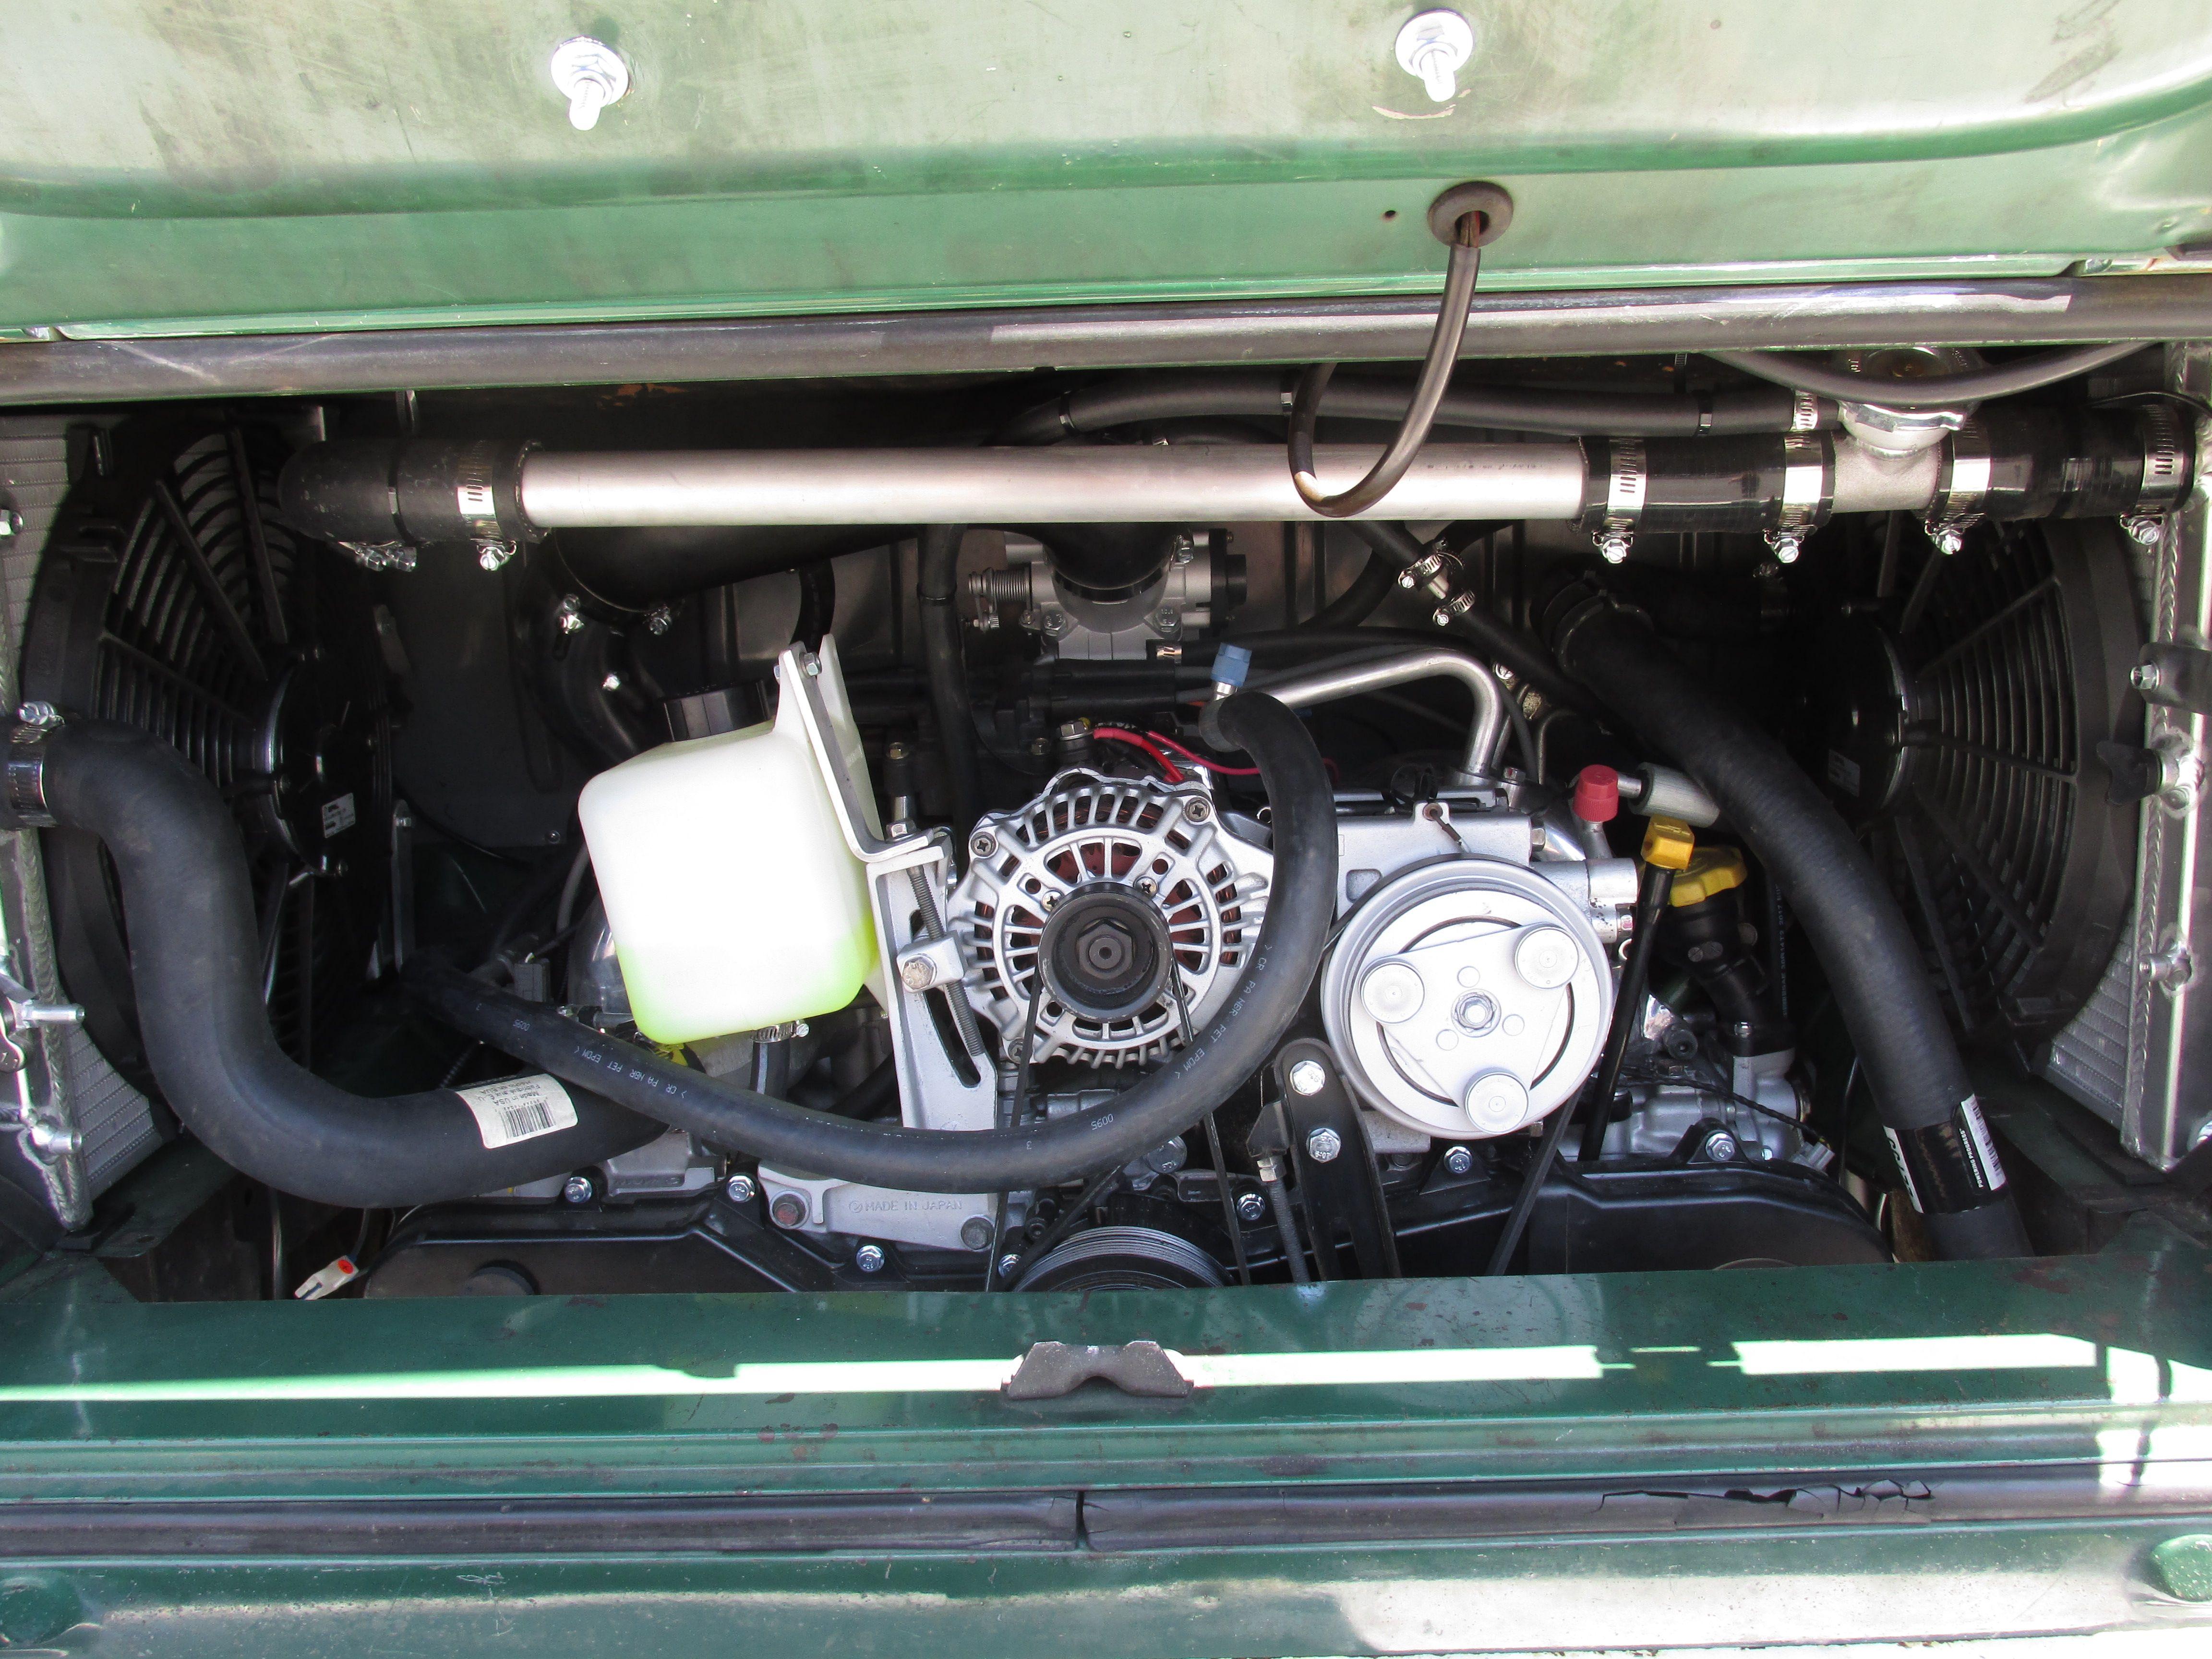 Subiswaps Subaru Engine Conversion In A 1971 Vw Bus Wiring Harness Subiswapssubaruconversionvolkswagenvwvwbusvwbugvanagon